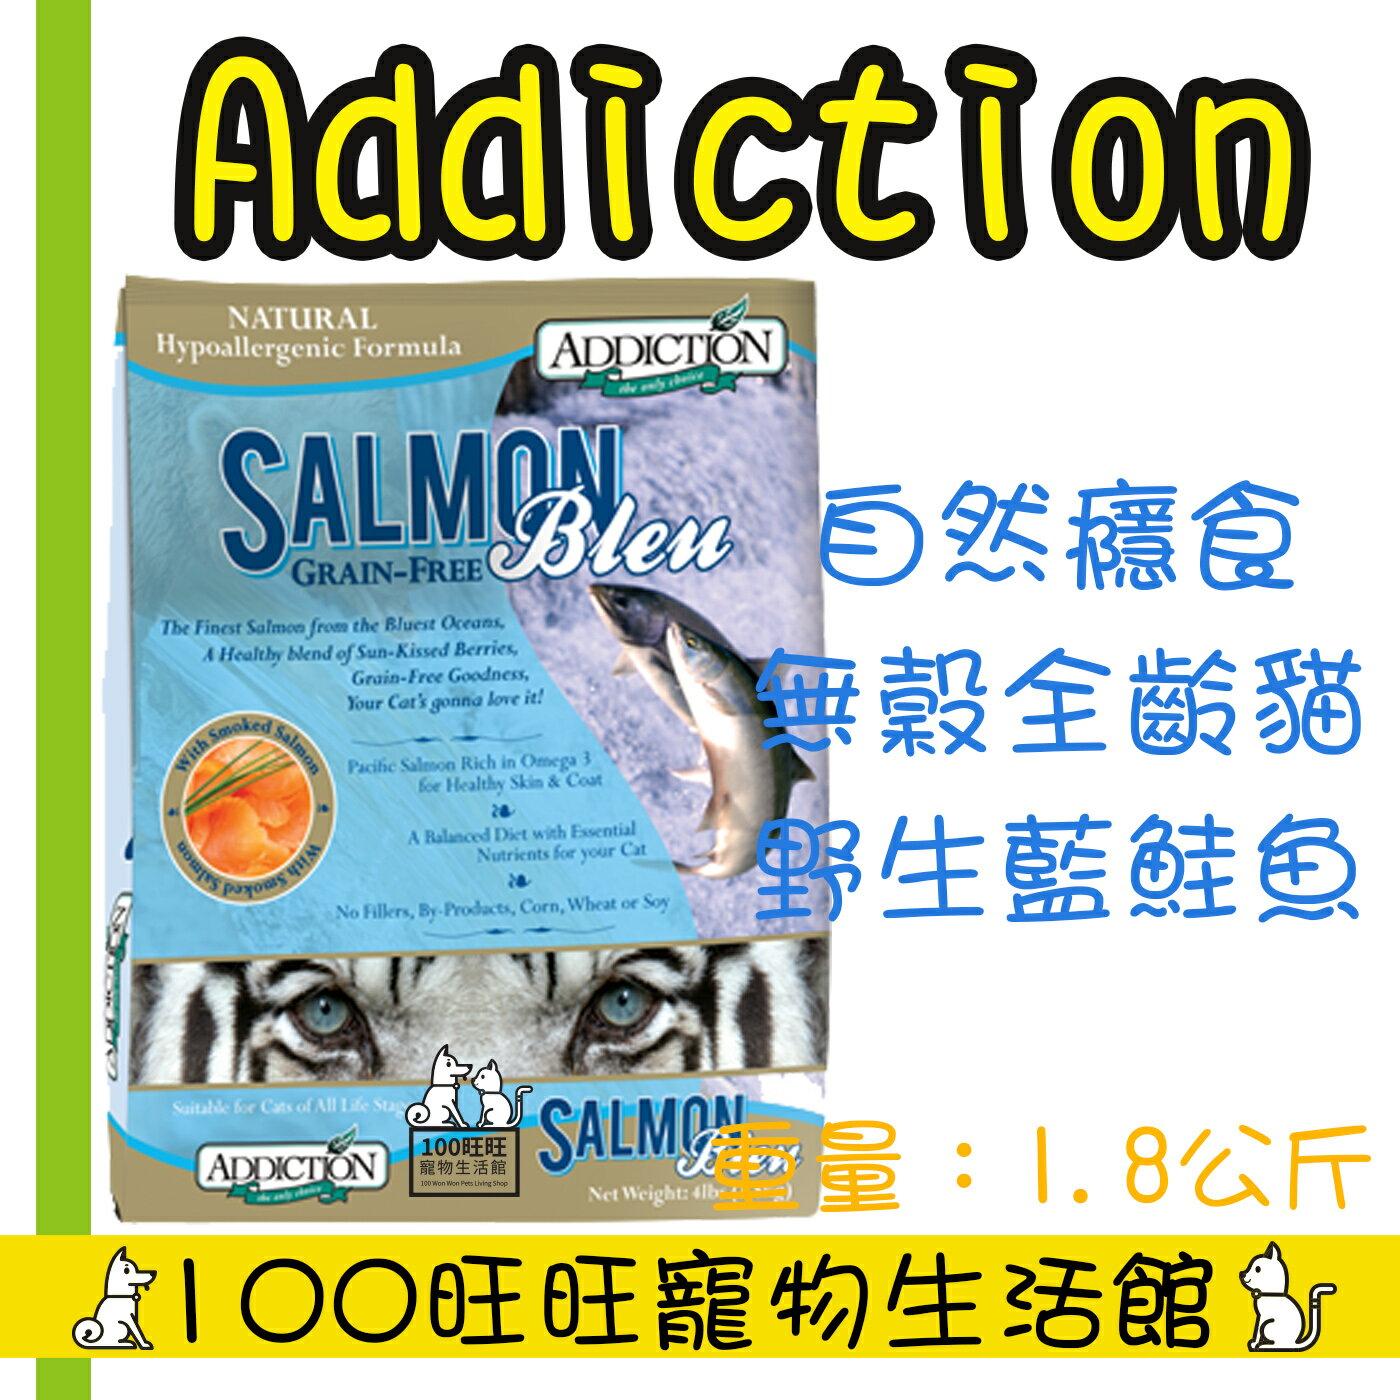 Addiction自然癮食 無穀藍鮭魚貓寵食 貓糧 1.8公斤